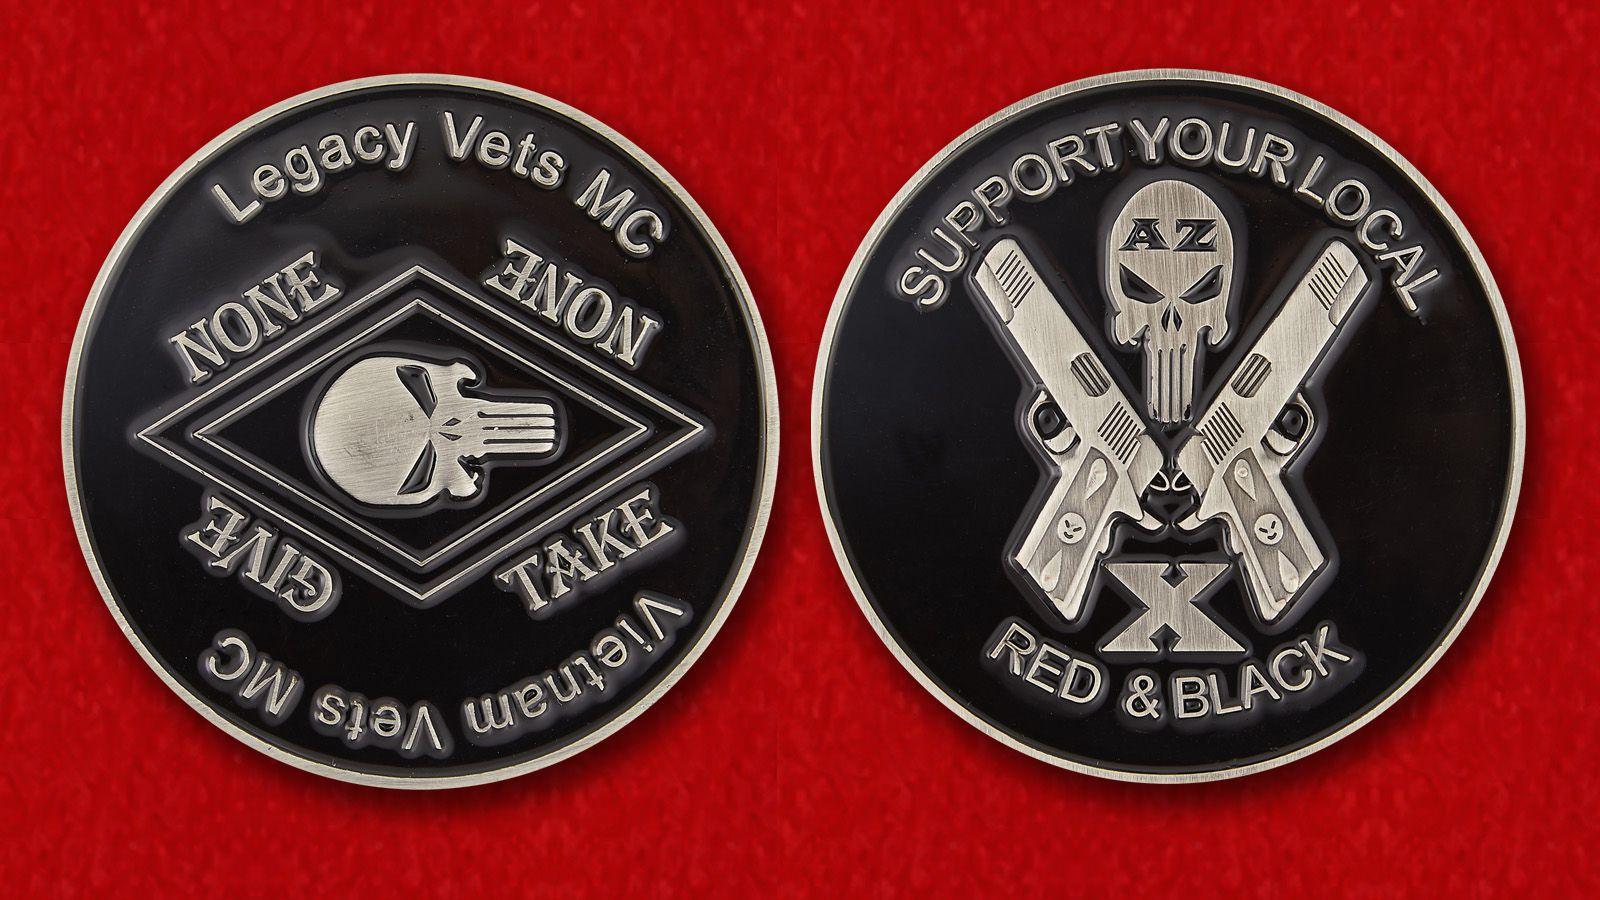 Челлендж коин мотоклуба ветеранов Вьетнама - аверс и реверс